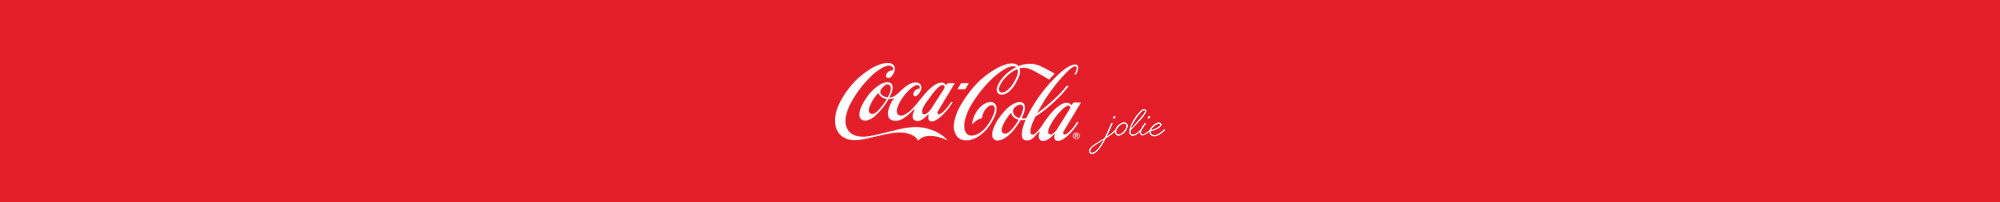 banner coca cola